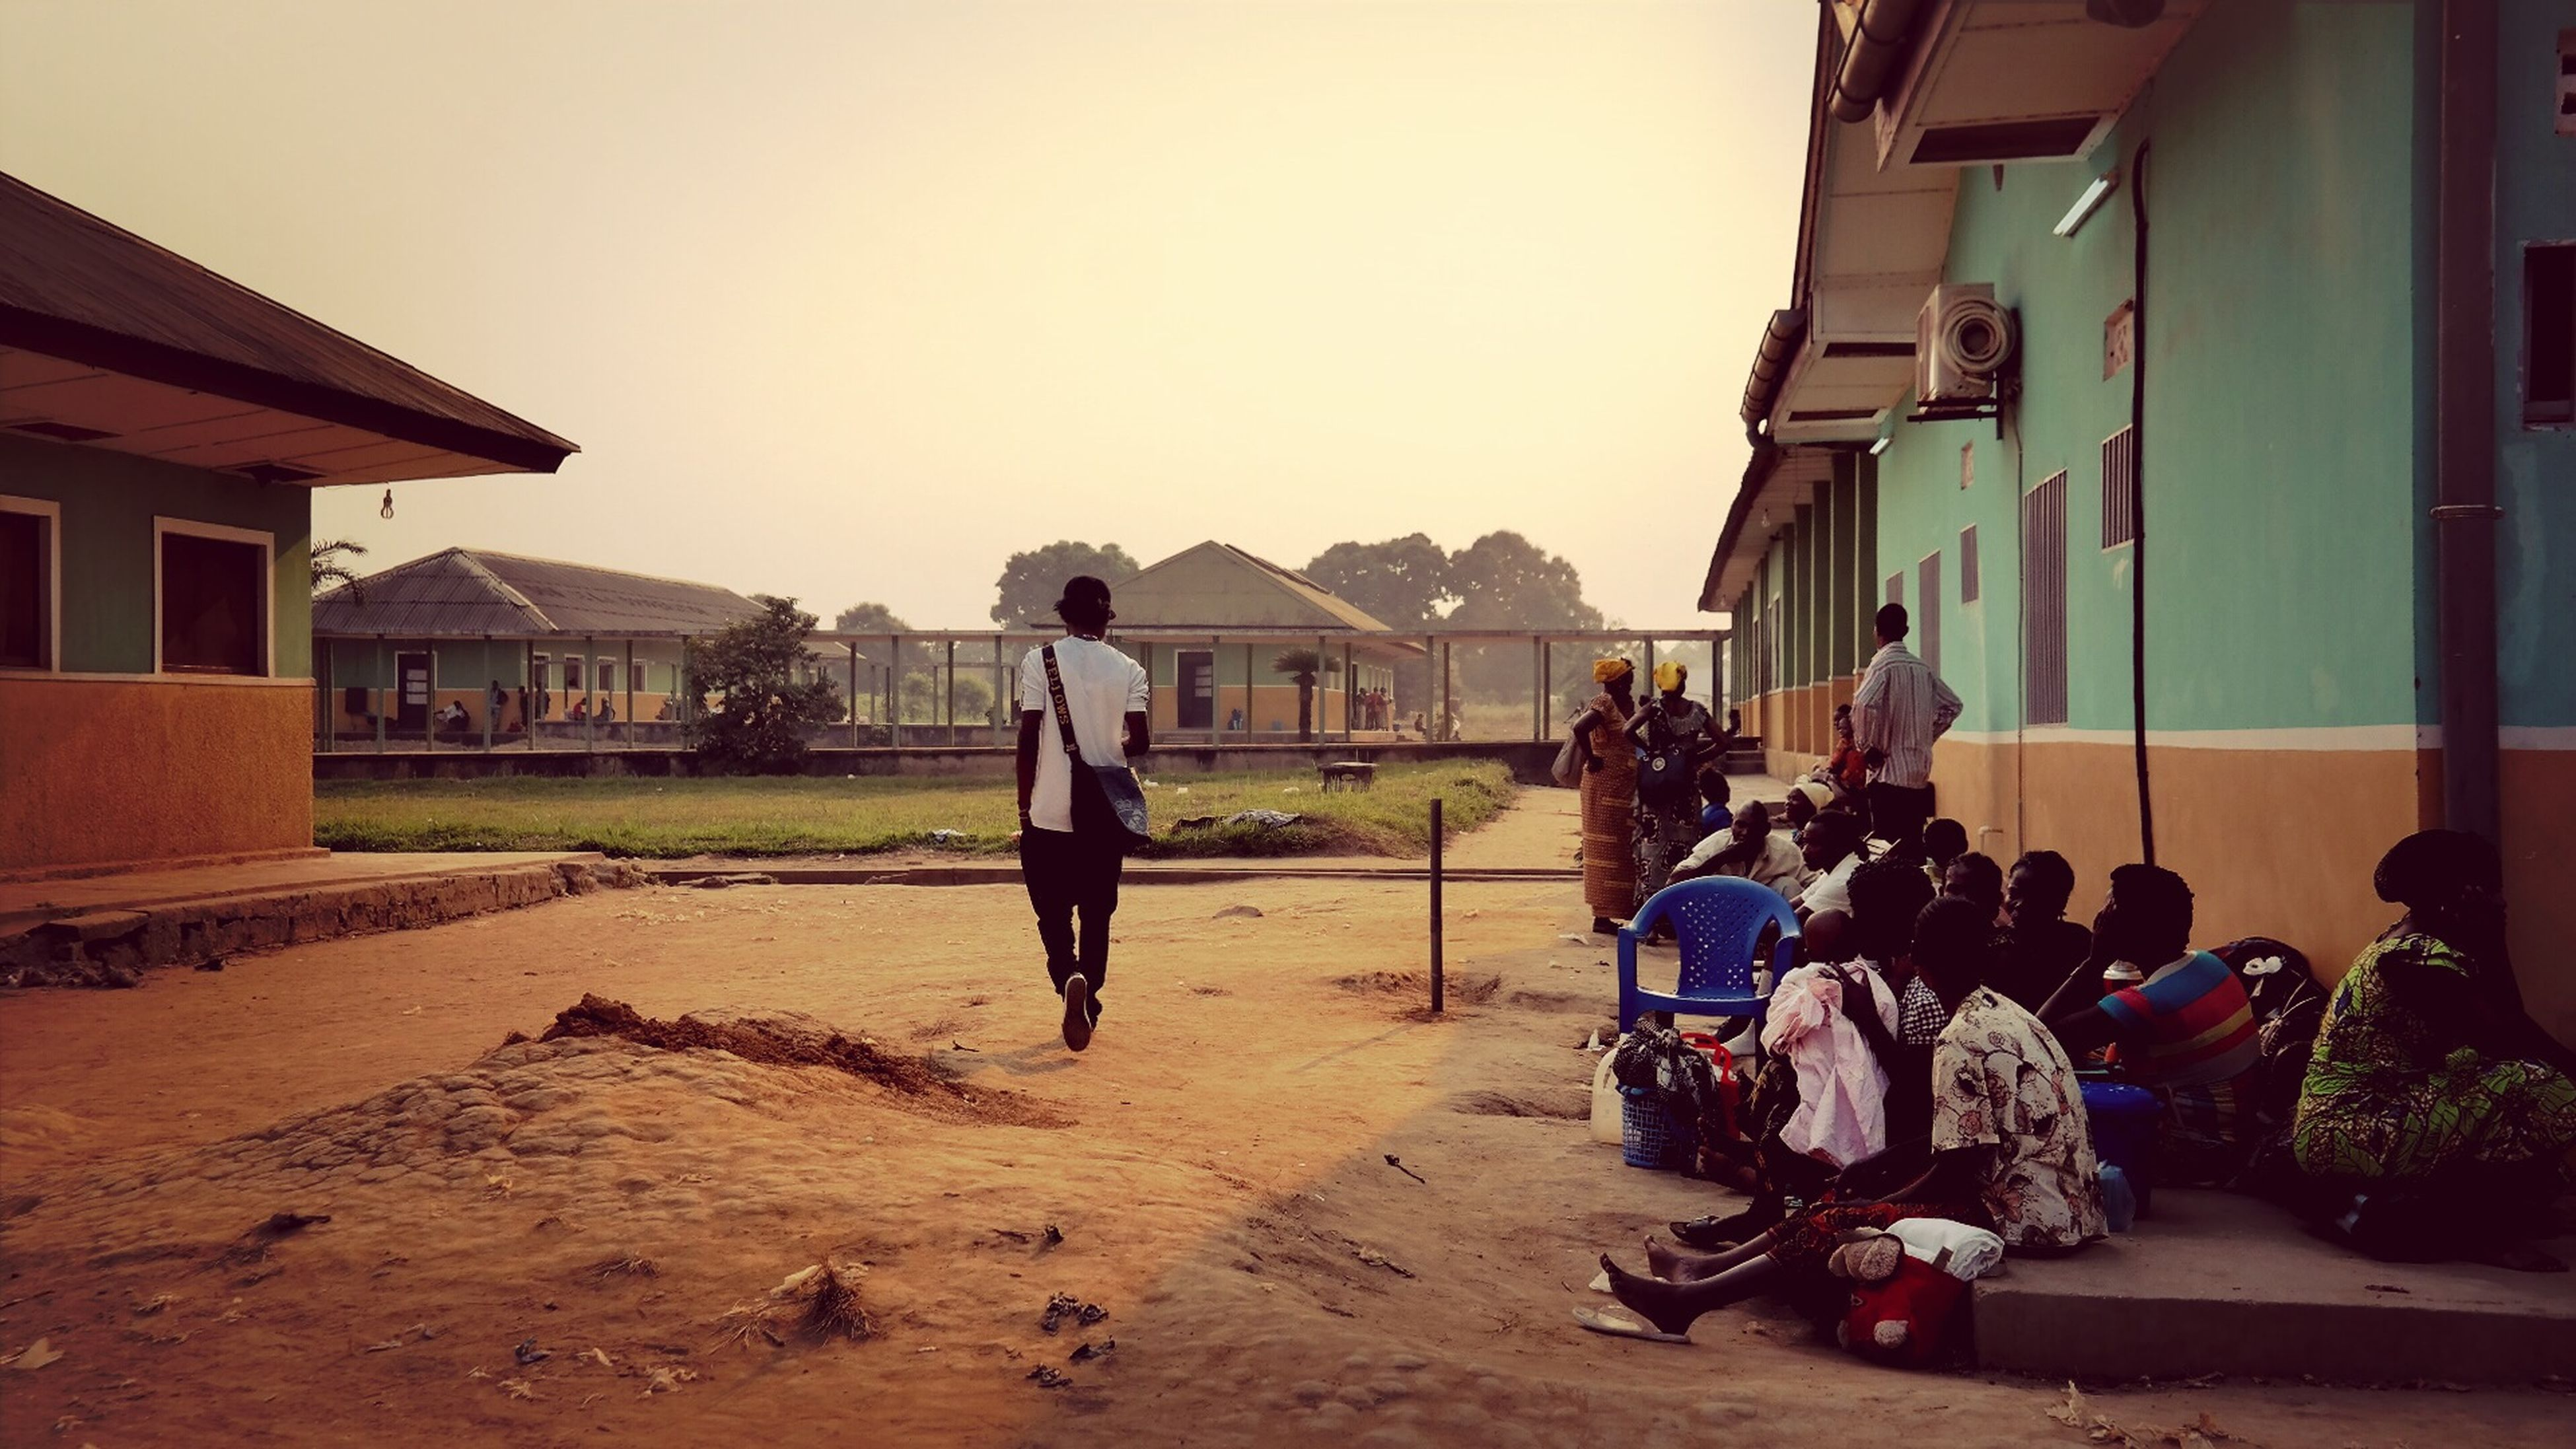 Democratic Republic Of The Congo Bandundu Ville People